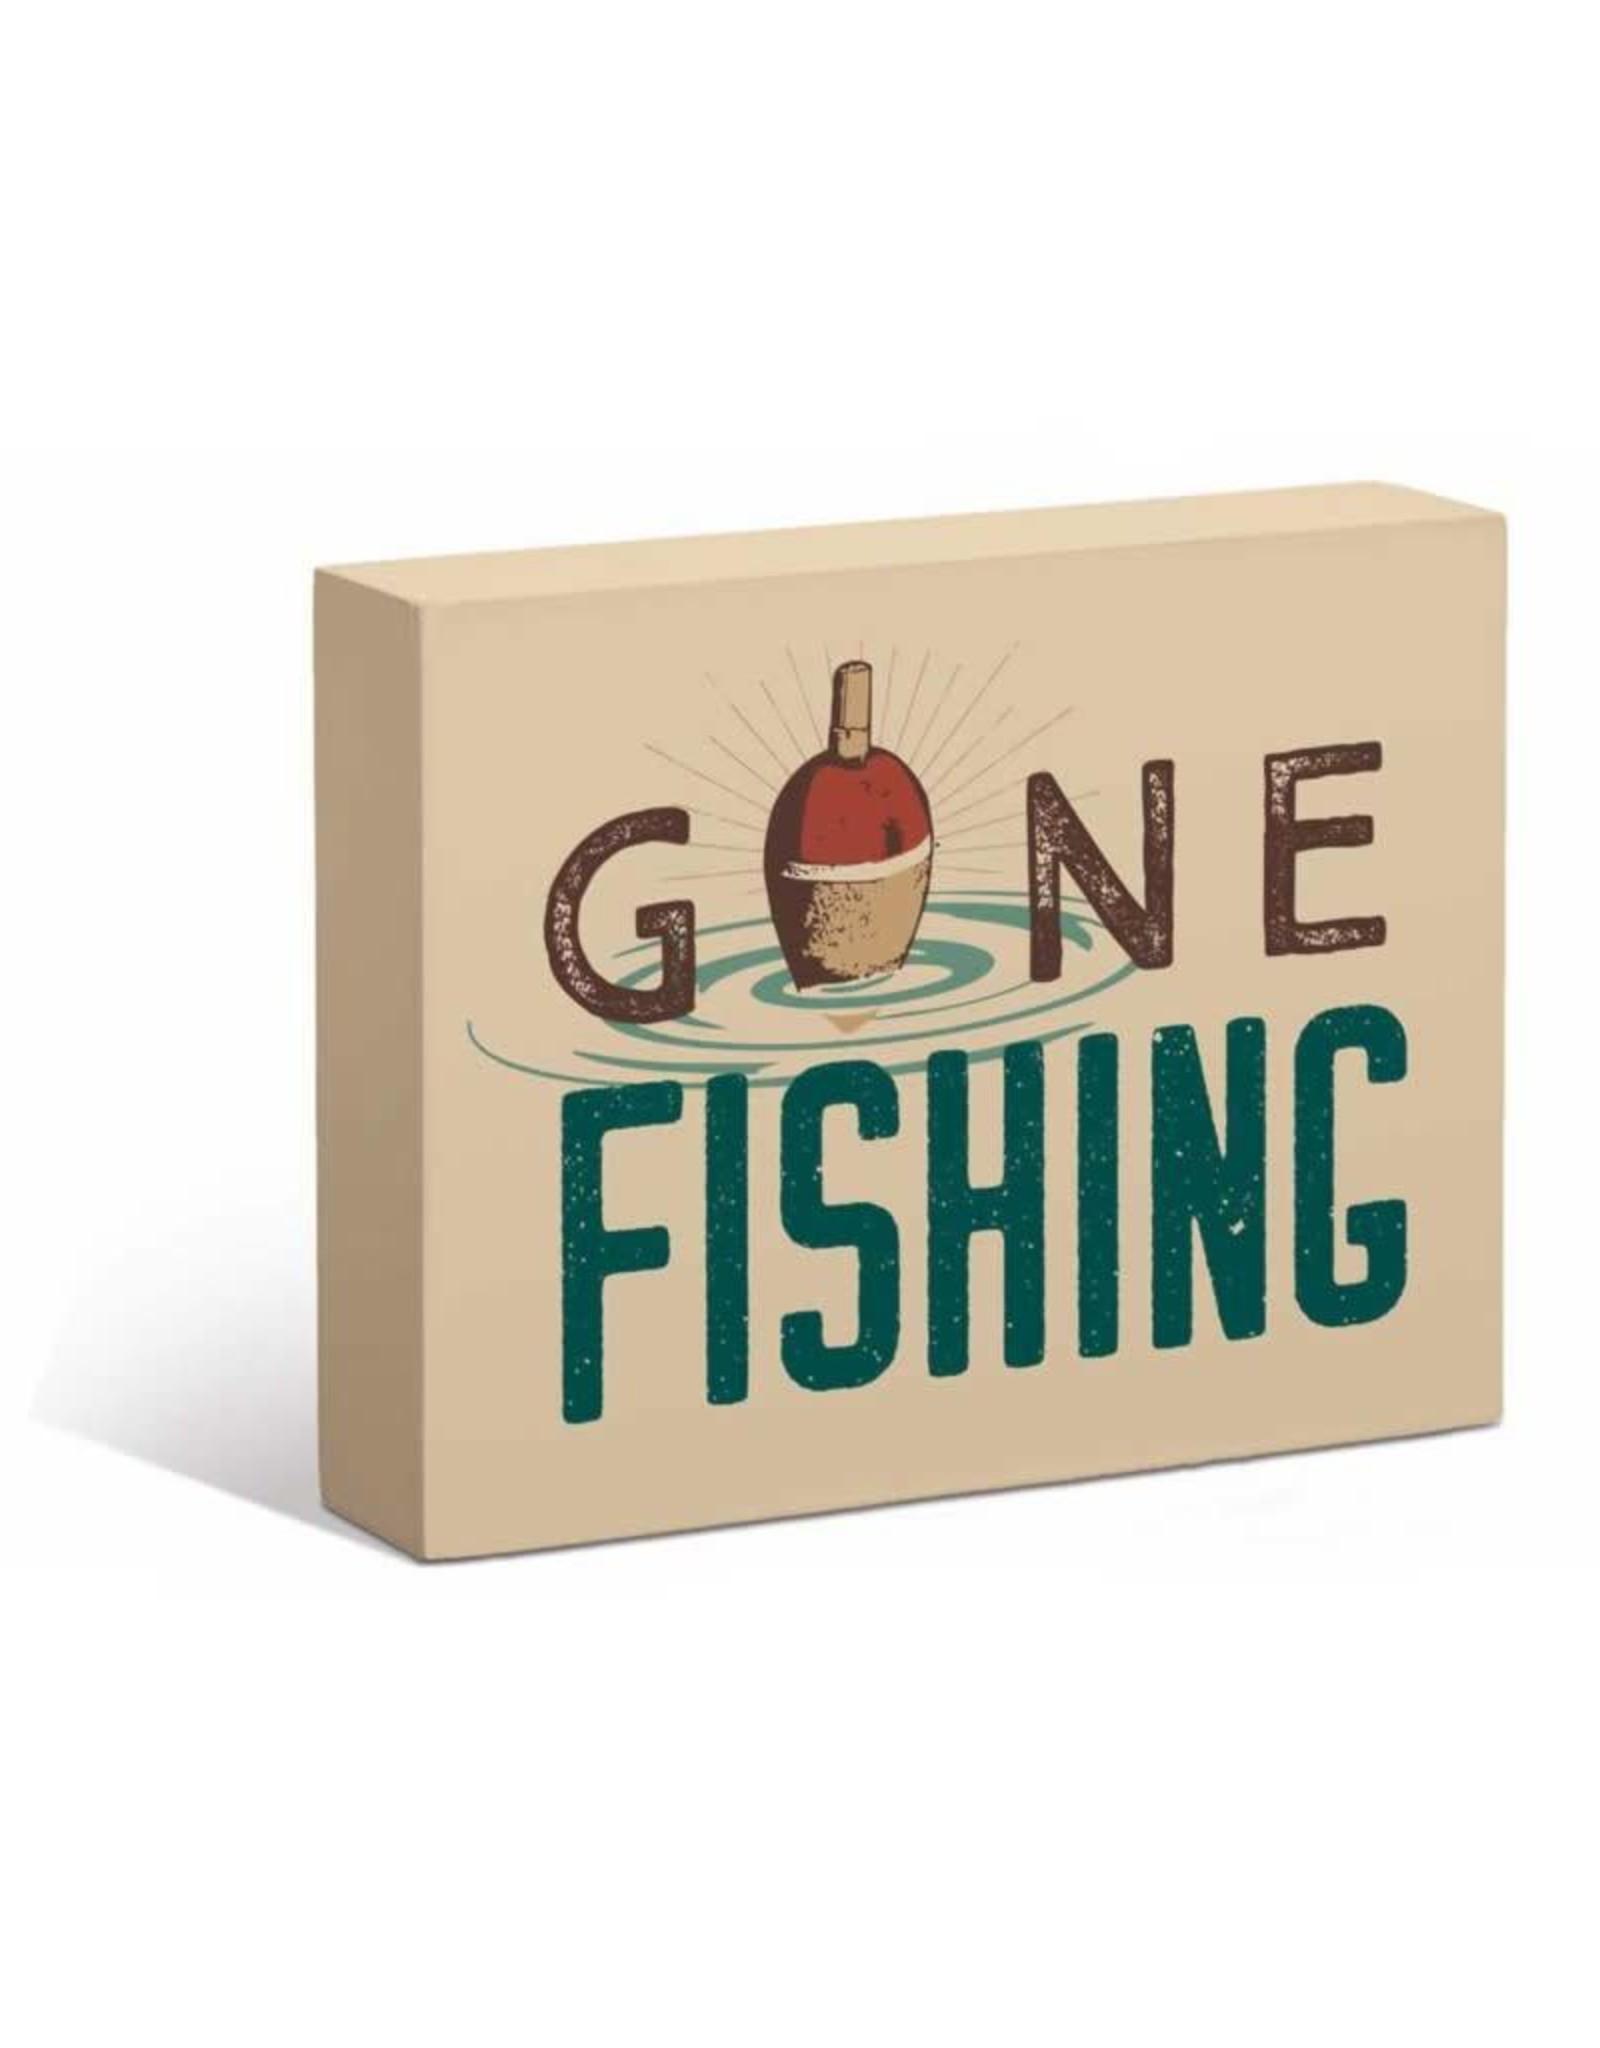 "Gone Fishing 7"" x 9"" Box Art Sign"